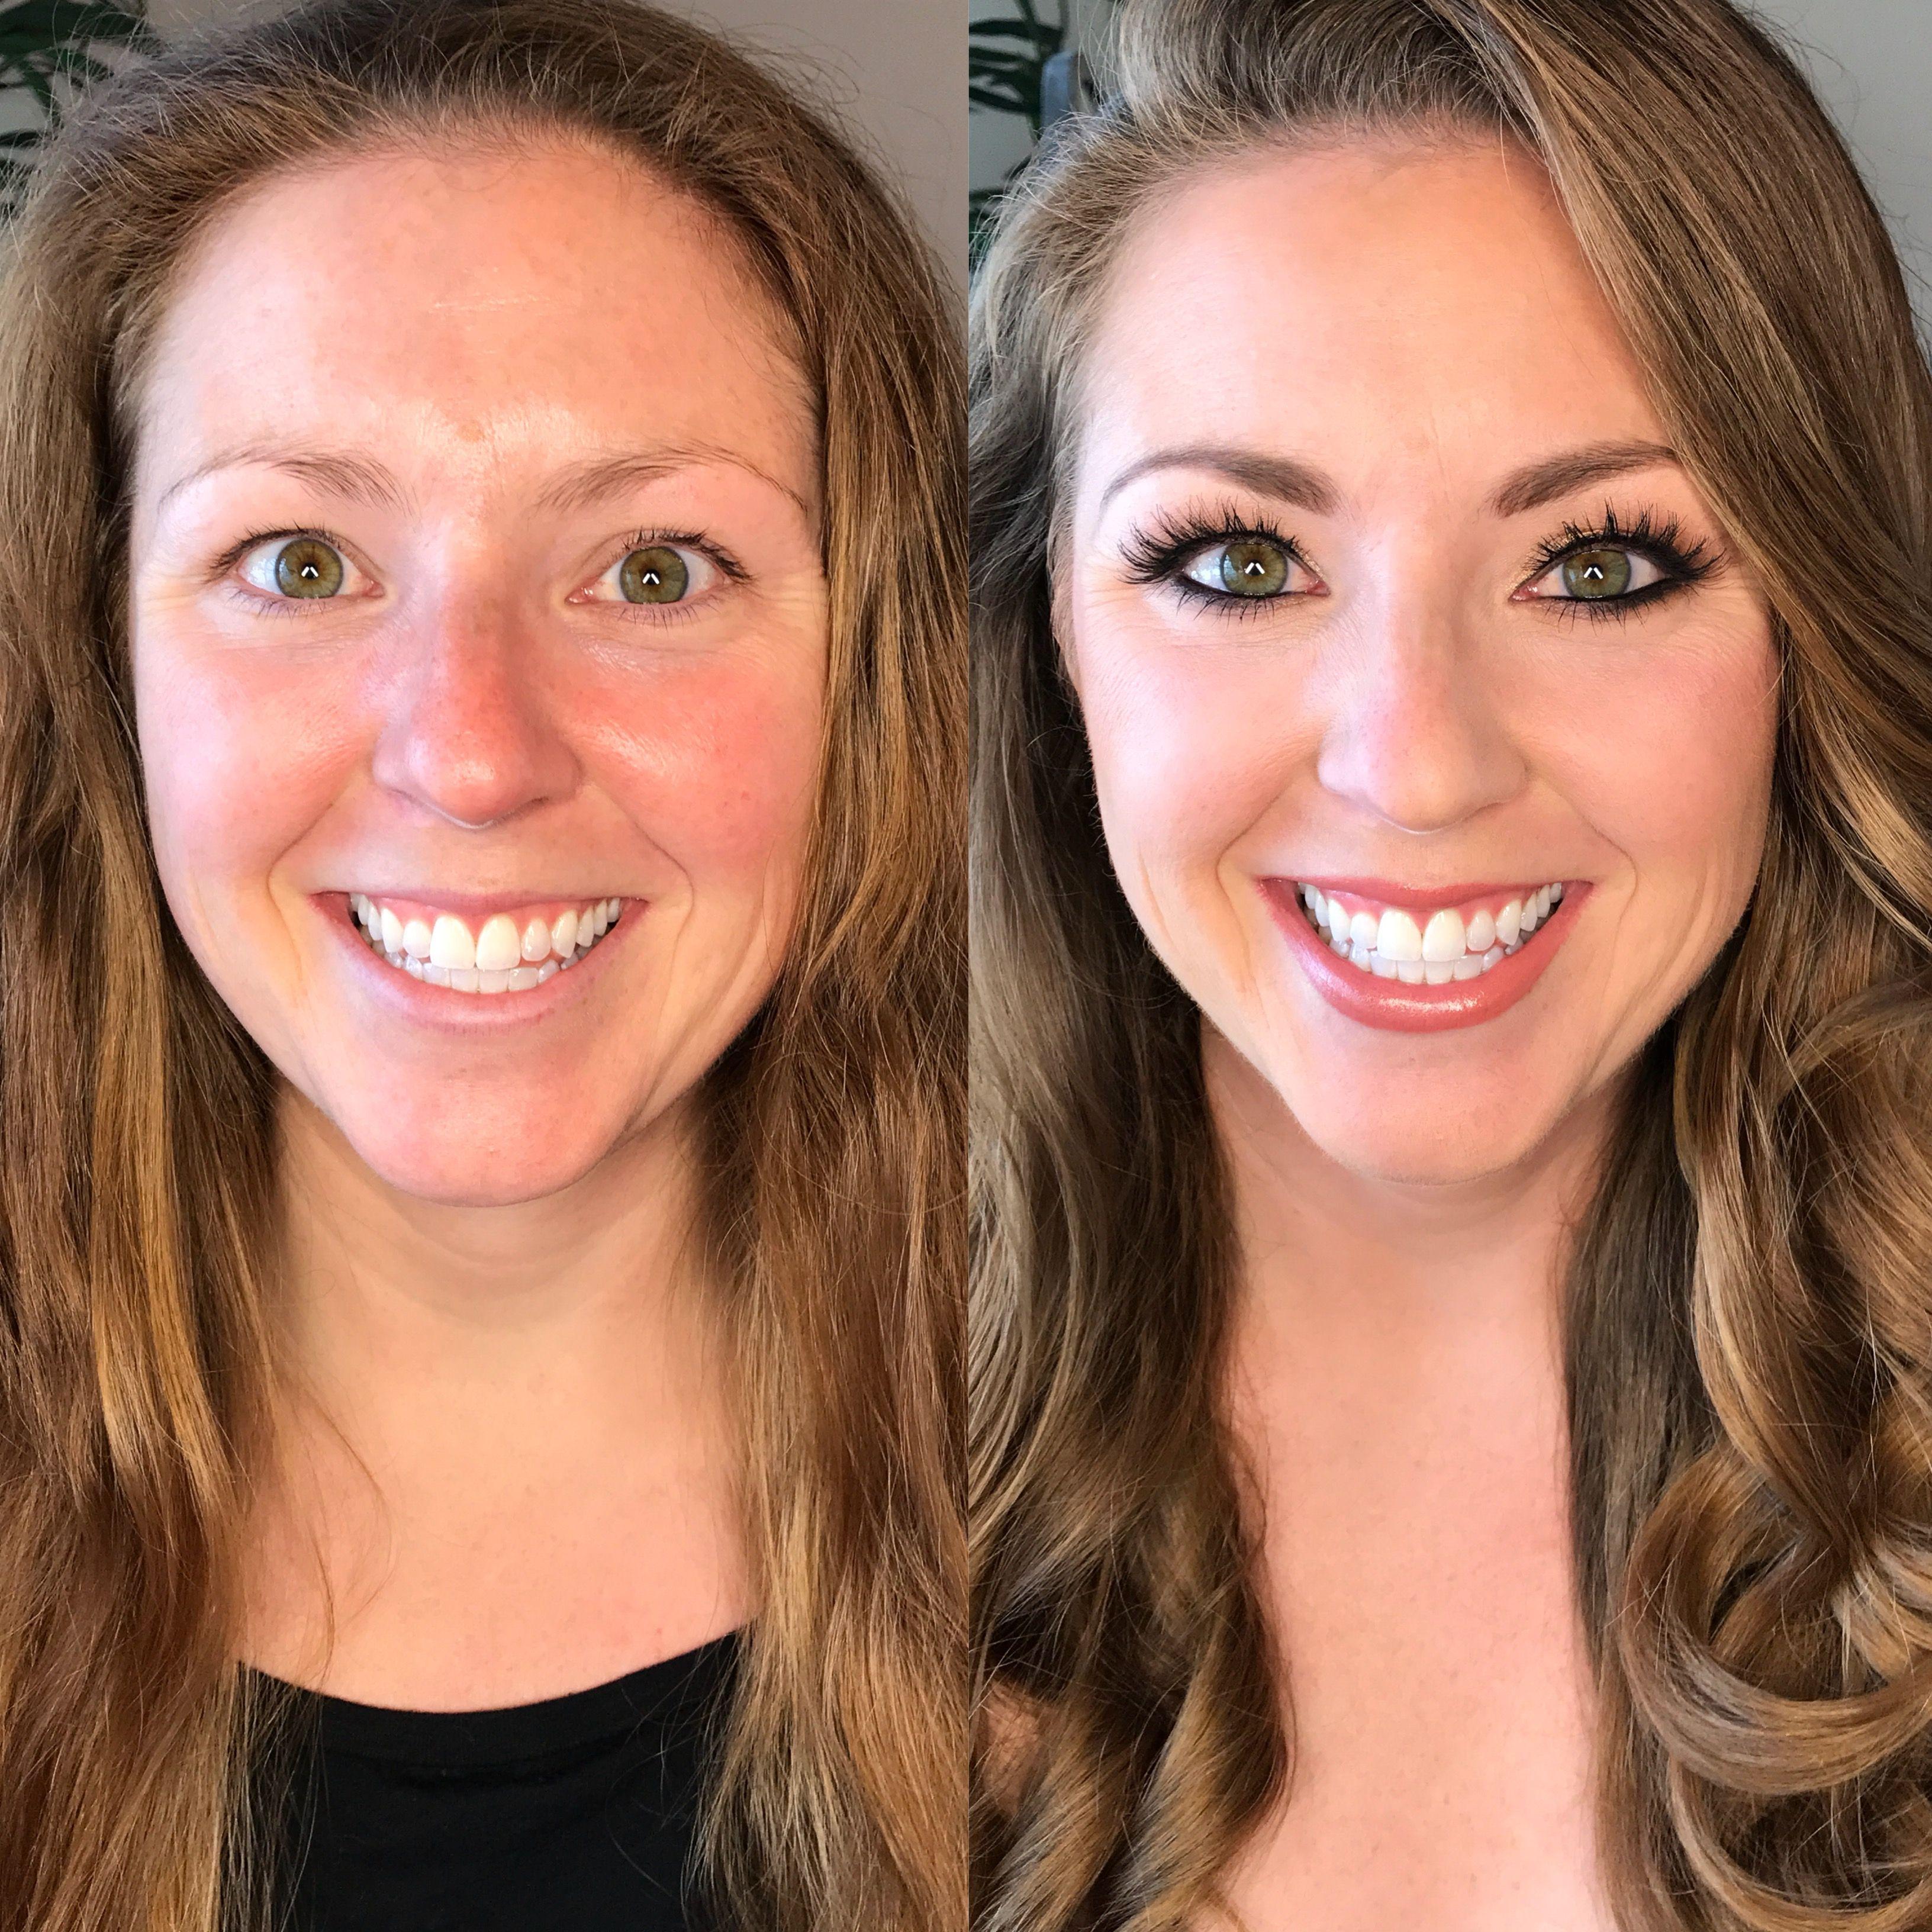 Before and after airbrush bridal wedding makeup natural